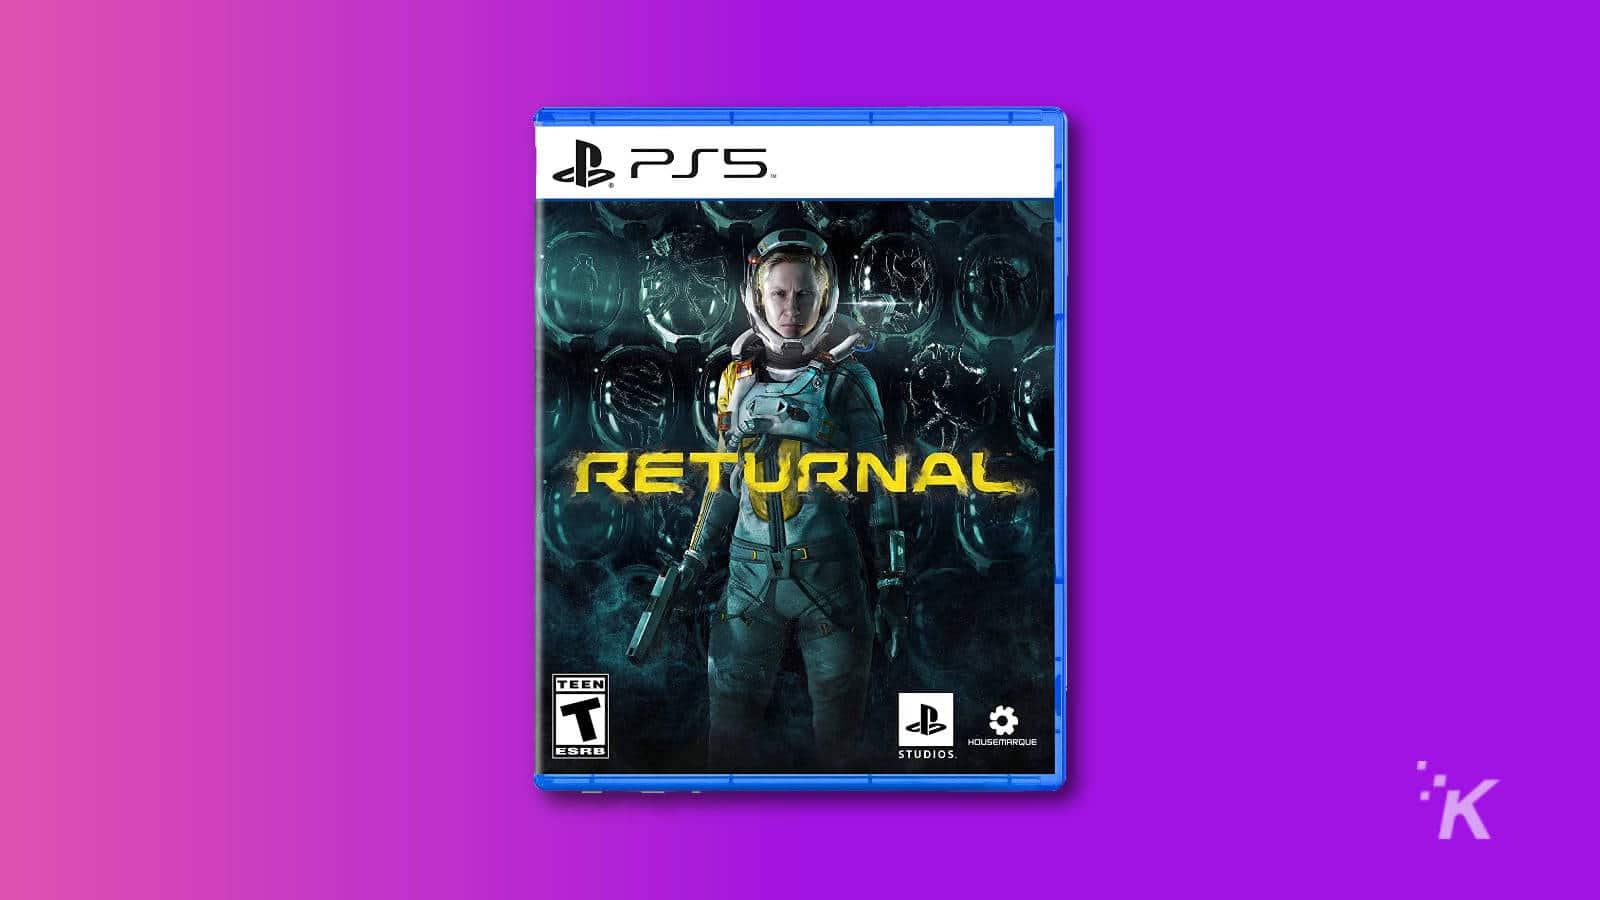 returnal ps5 game